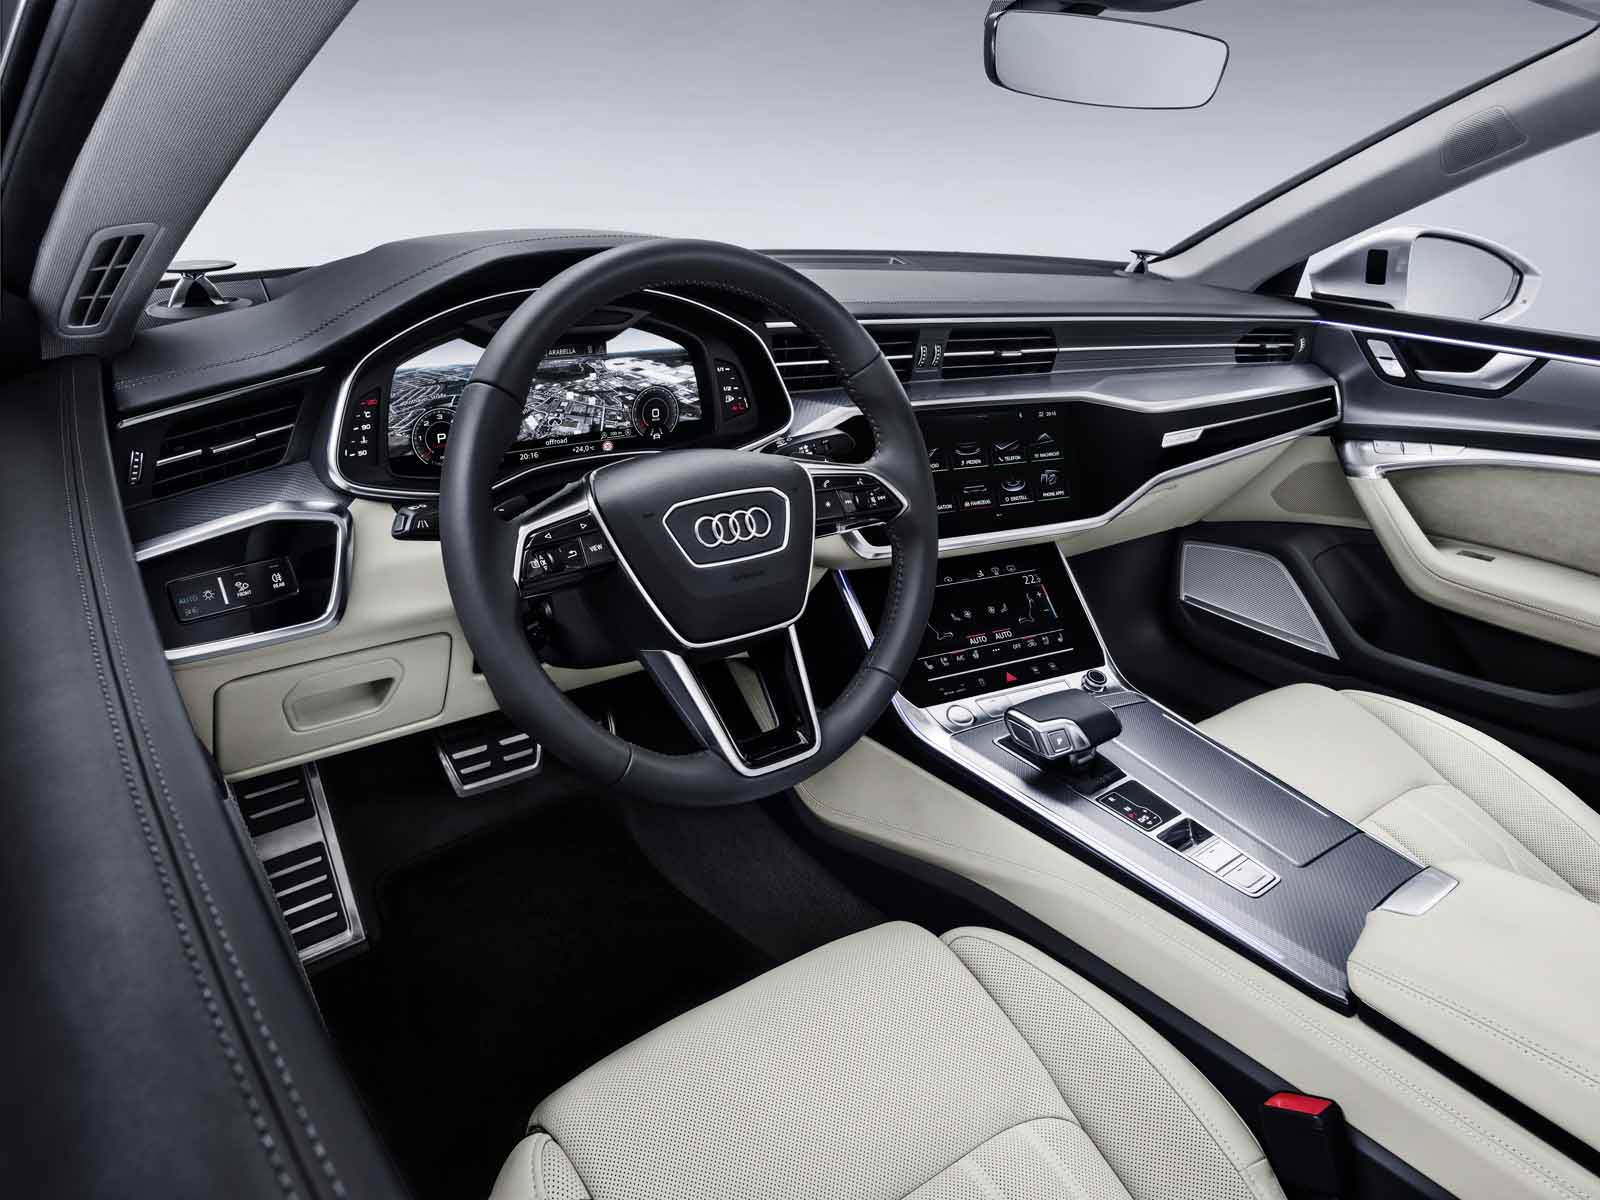 Audi S7 13 960x480 photo